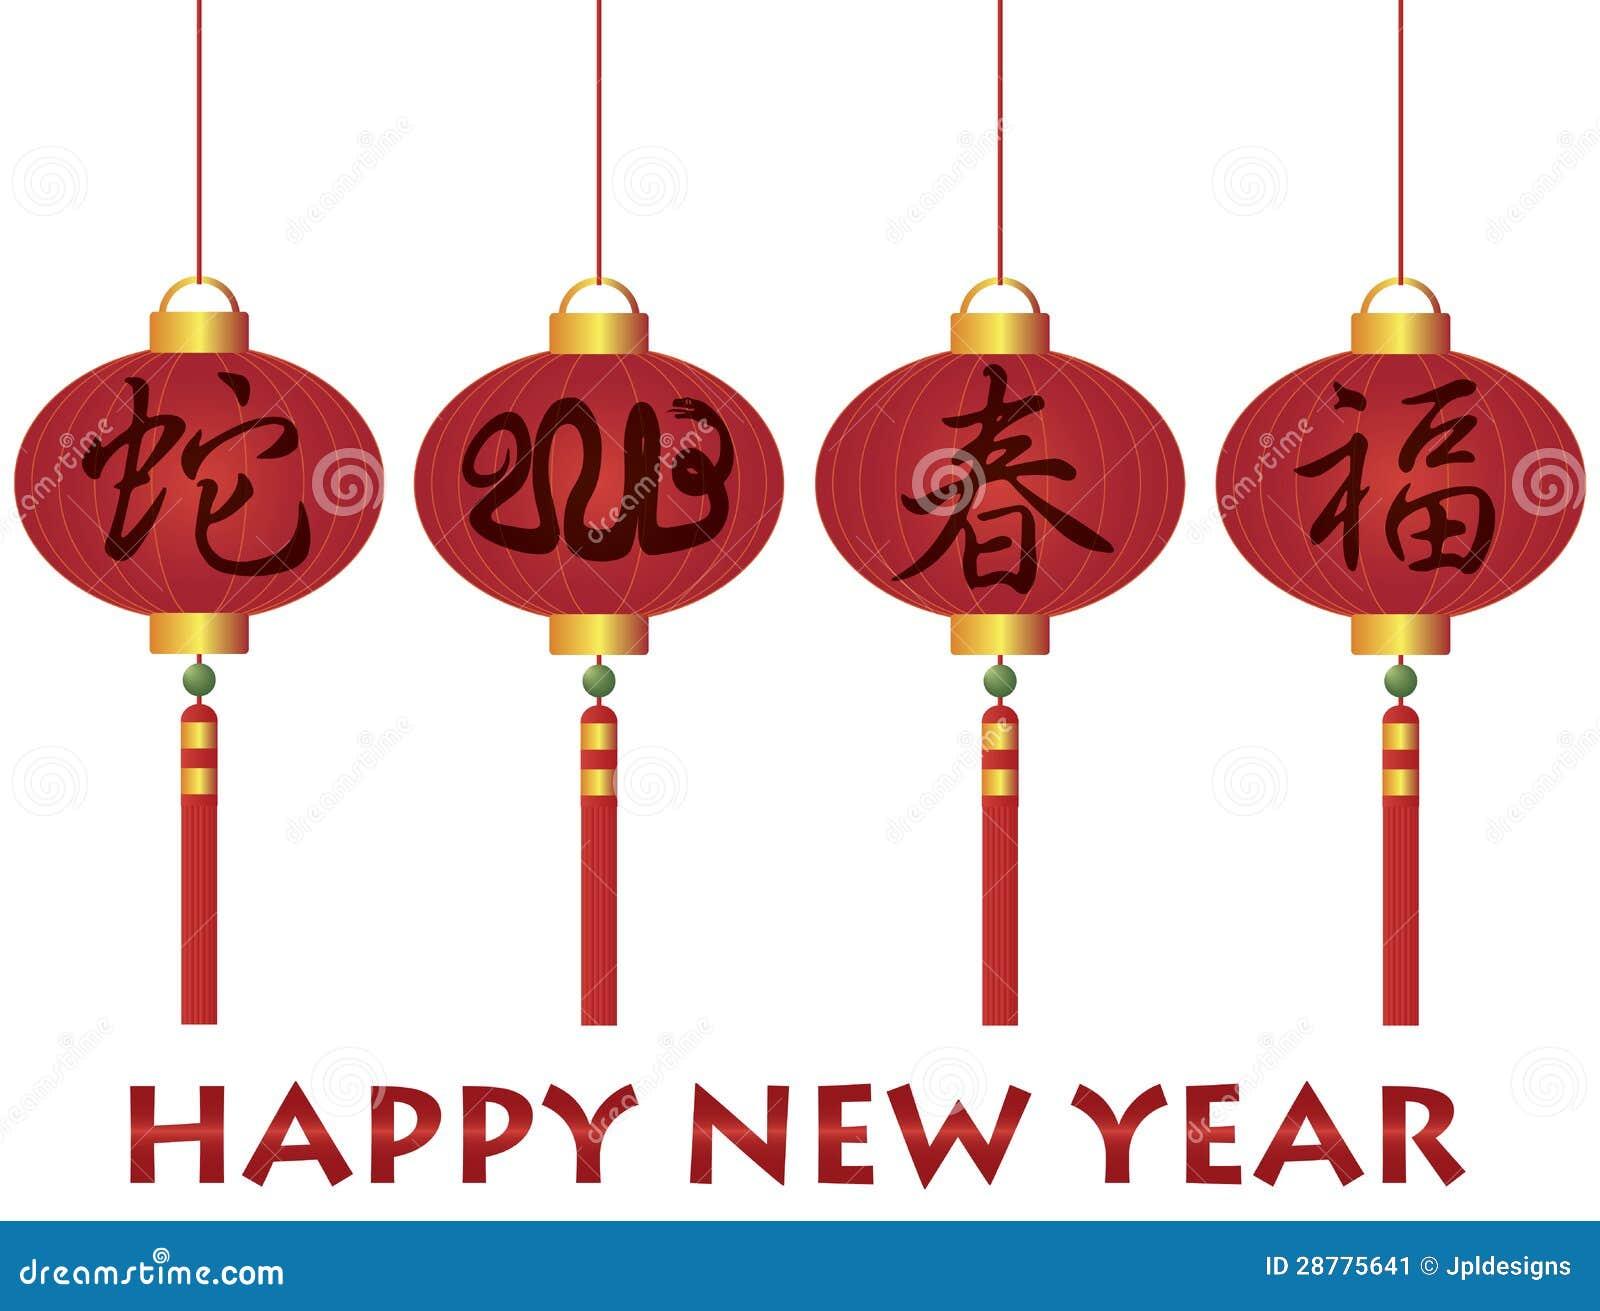 happy chinese new year snake lanterns illustration stock image - Happy New Year Chinese